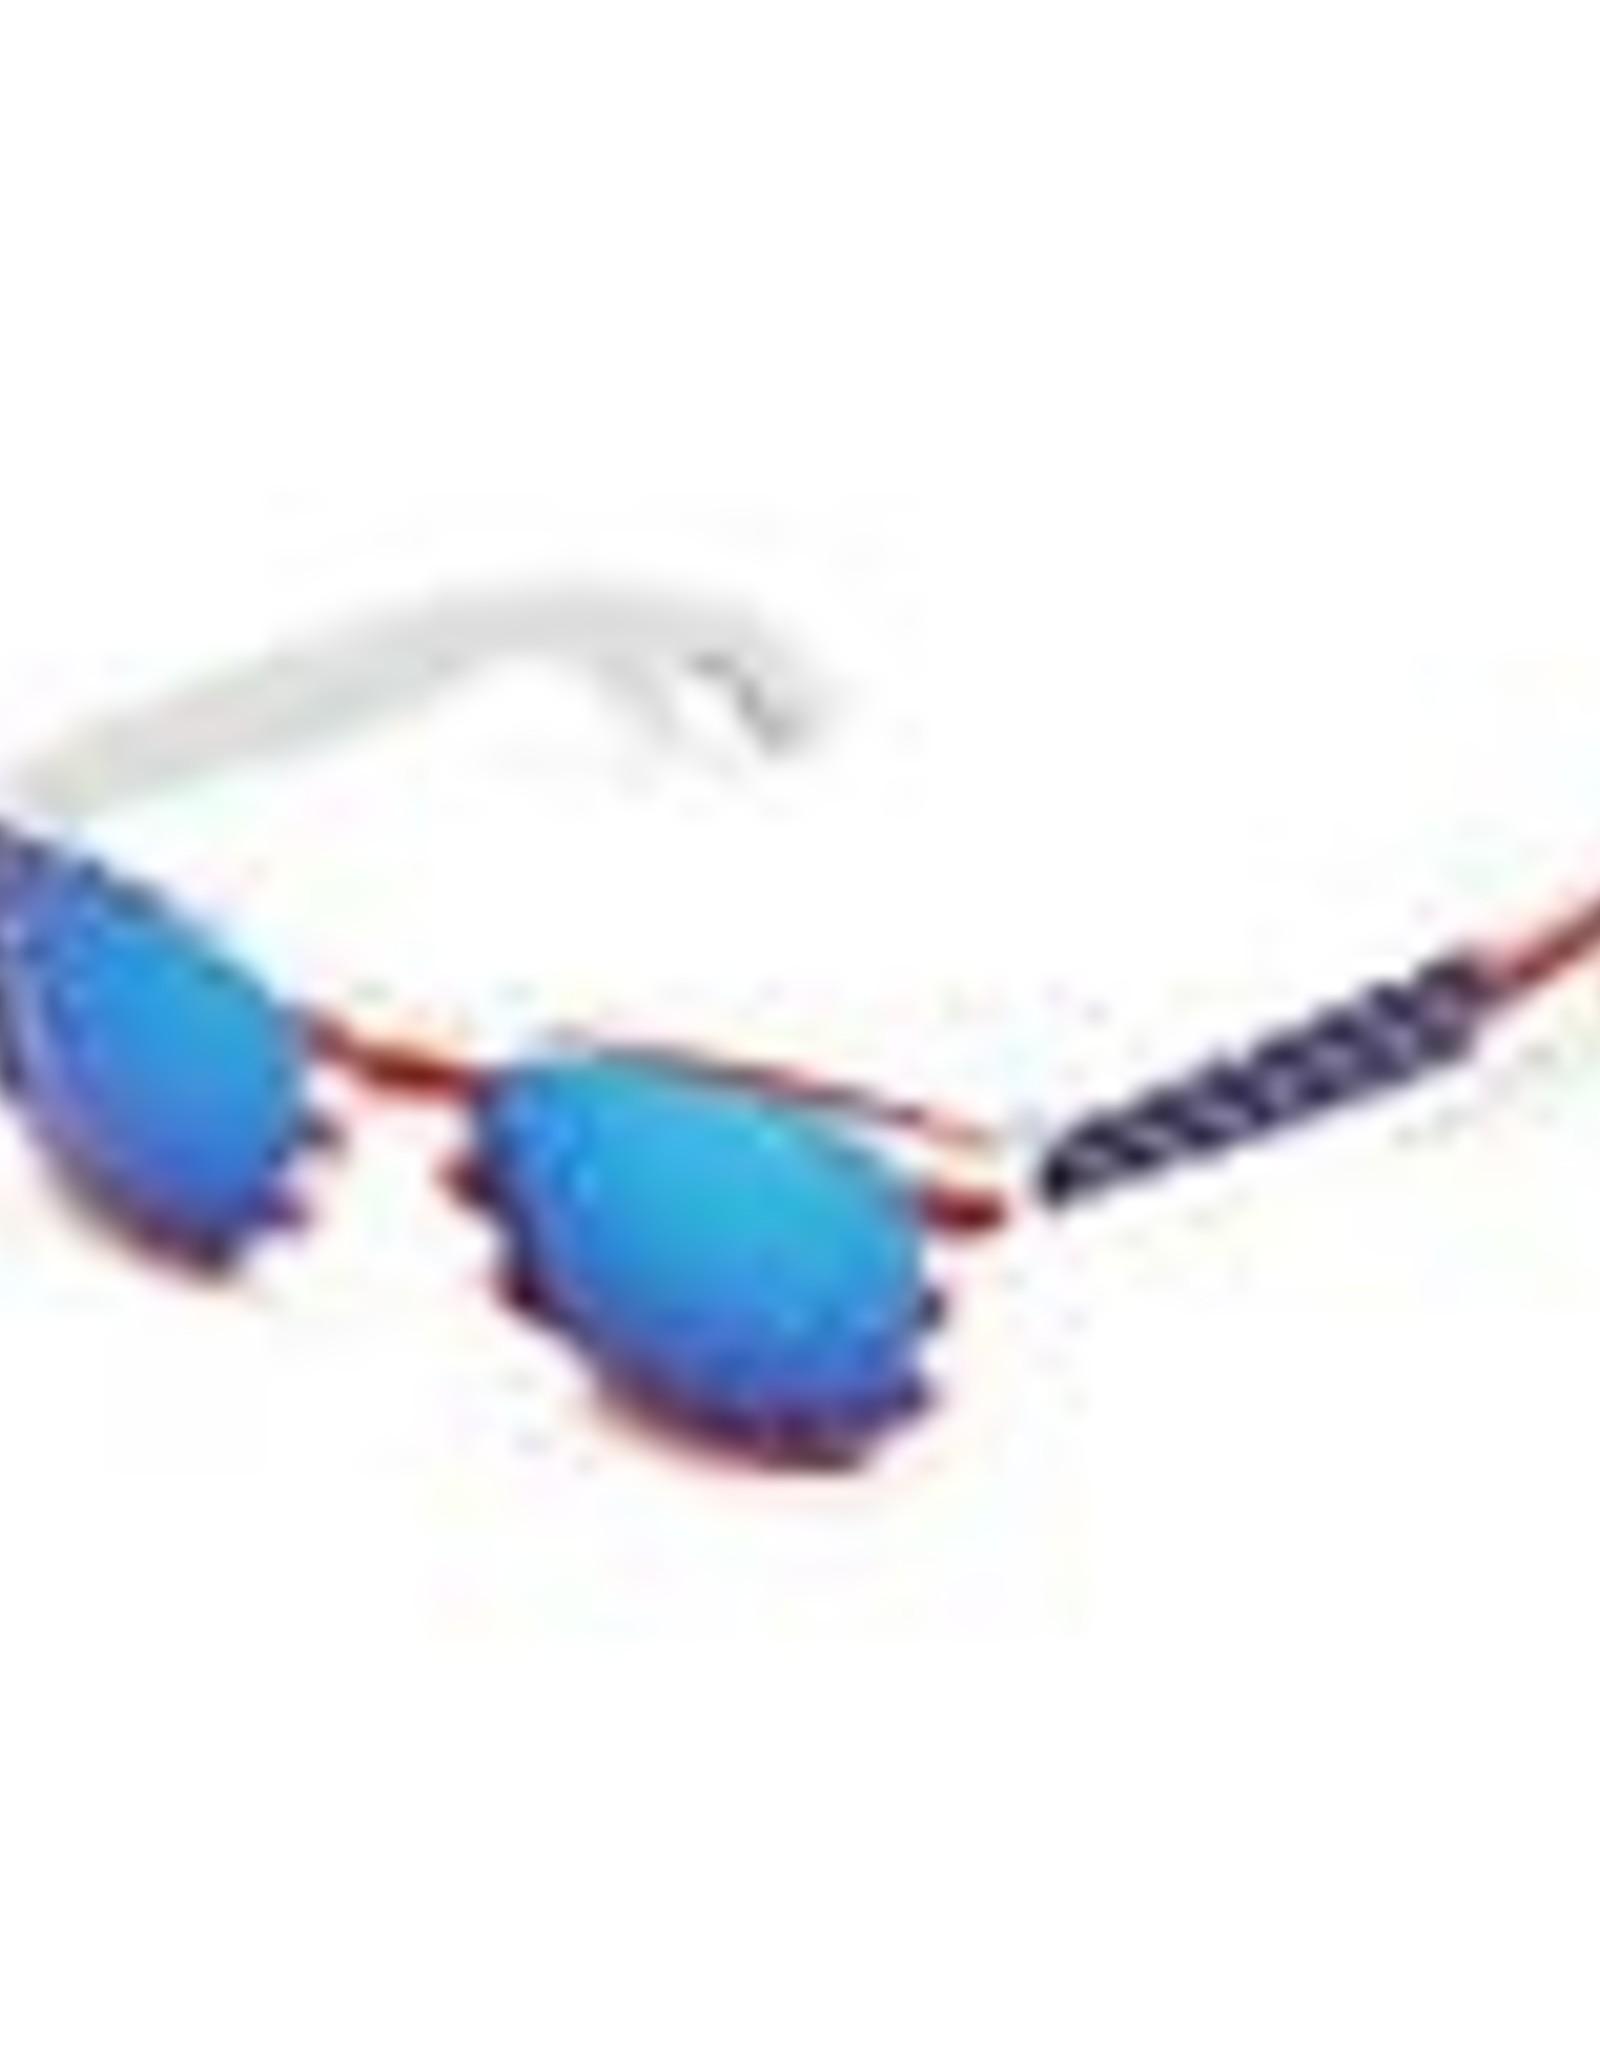 Foster & Rye Americana Bottle Opener Sunglasses